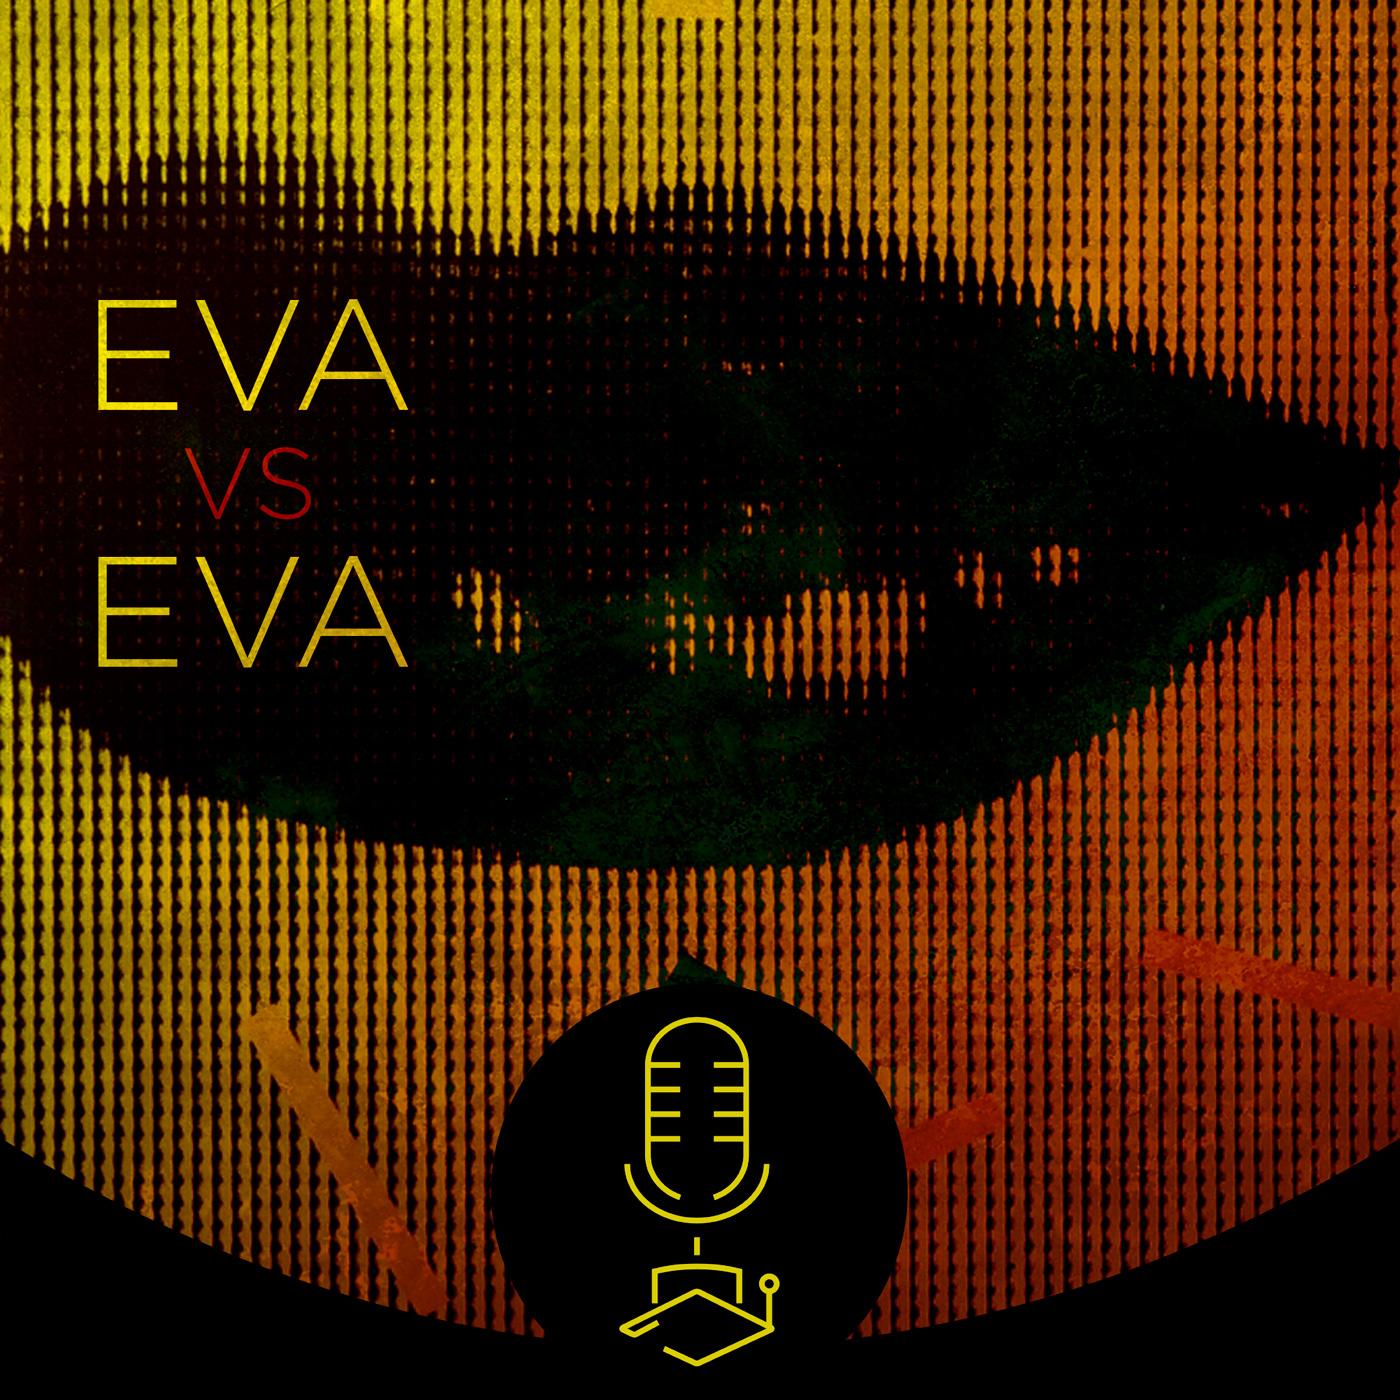 Eva vs. Eva